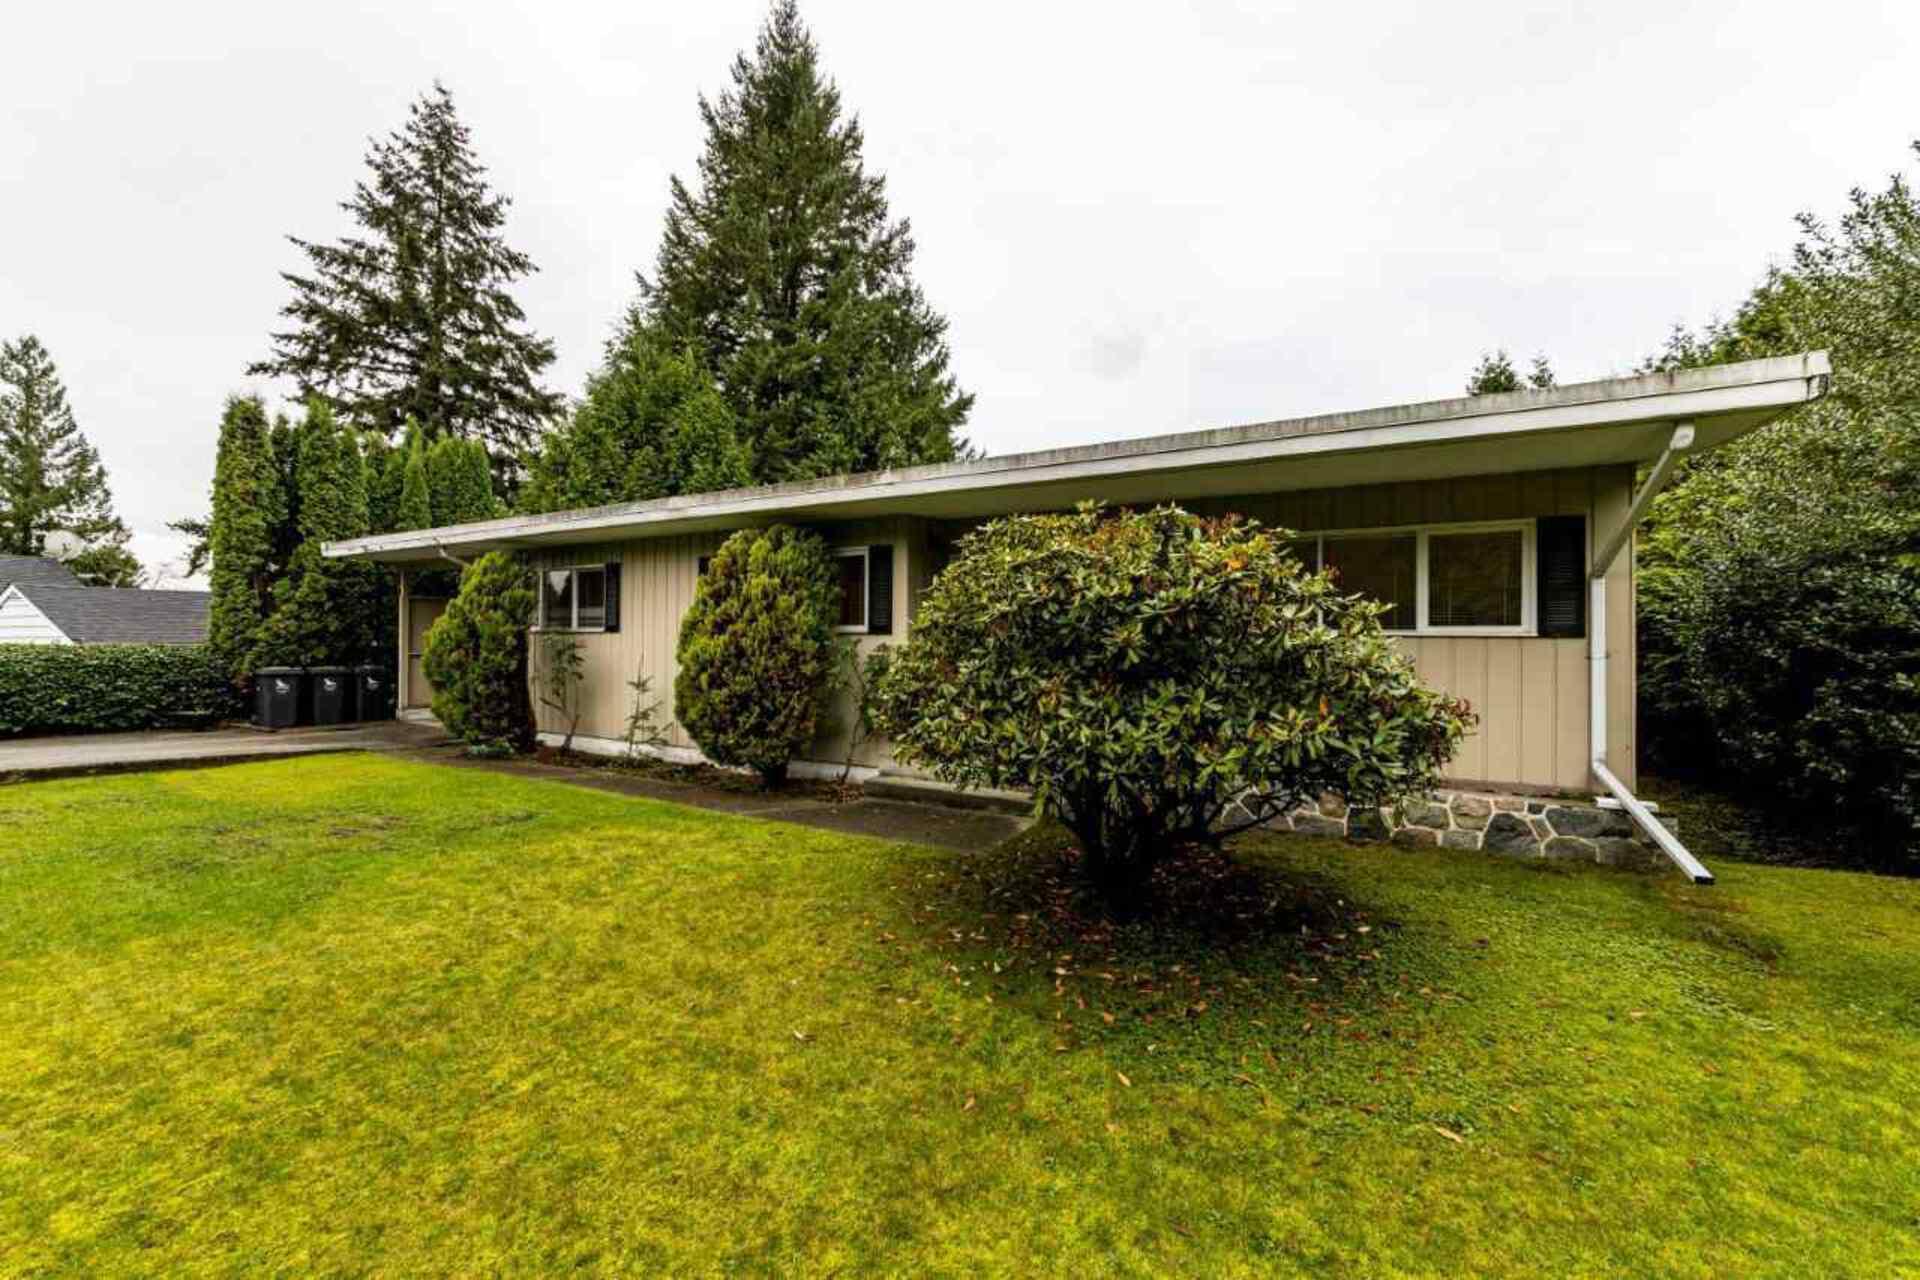 4363-highland-boulevard-forest-hills-nv-north-vancouver-27 at 4363 Highland Boulevard, Forest Hills NV, North Vancouver